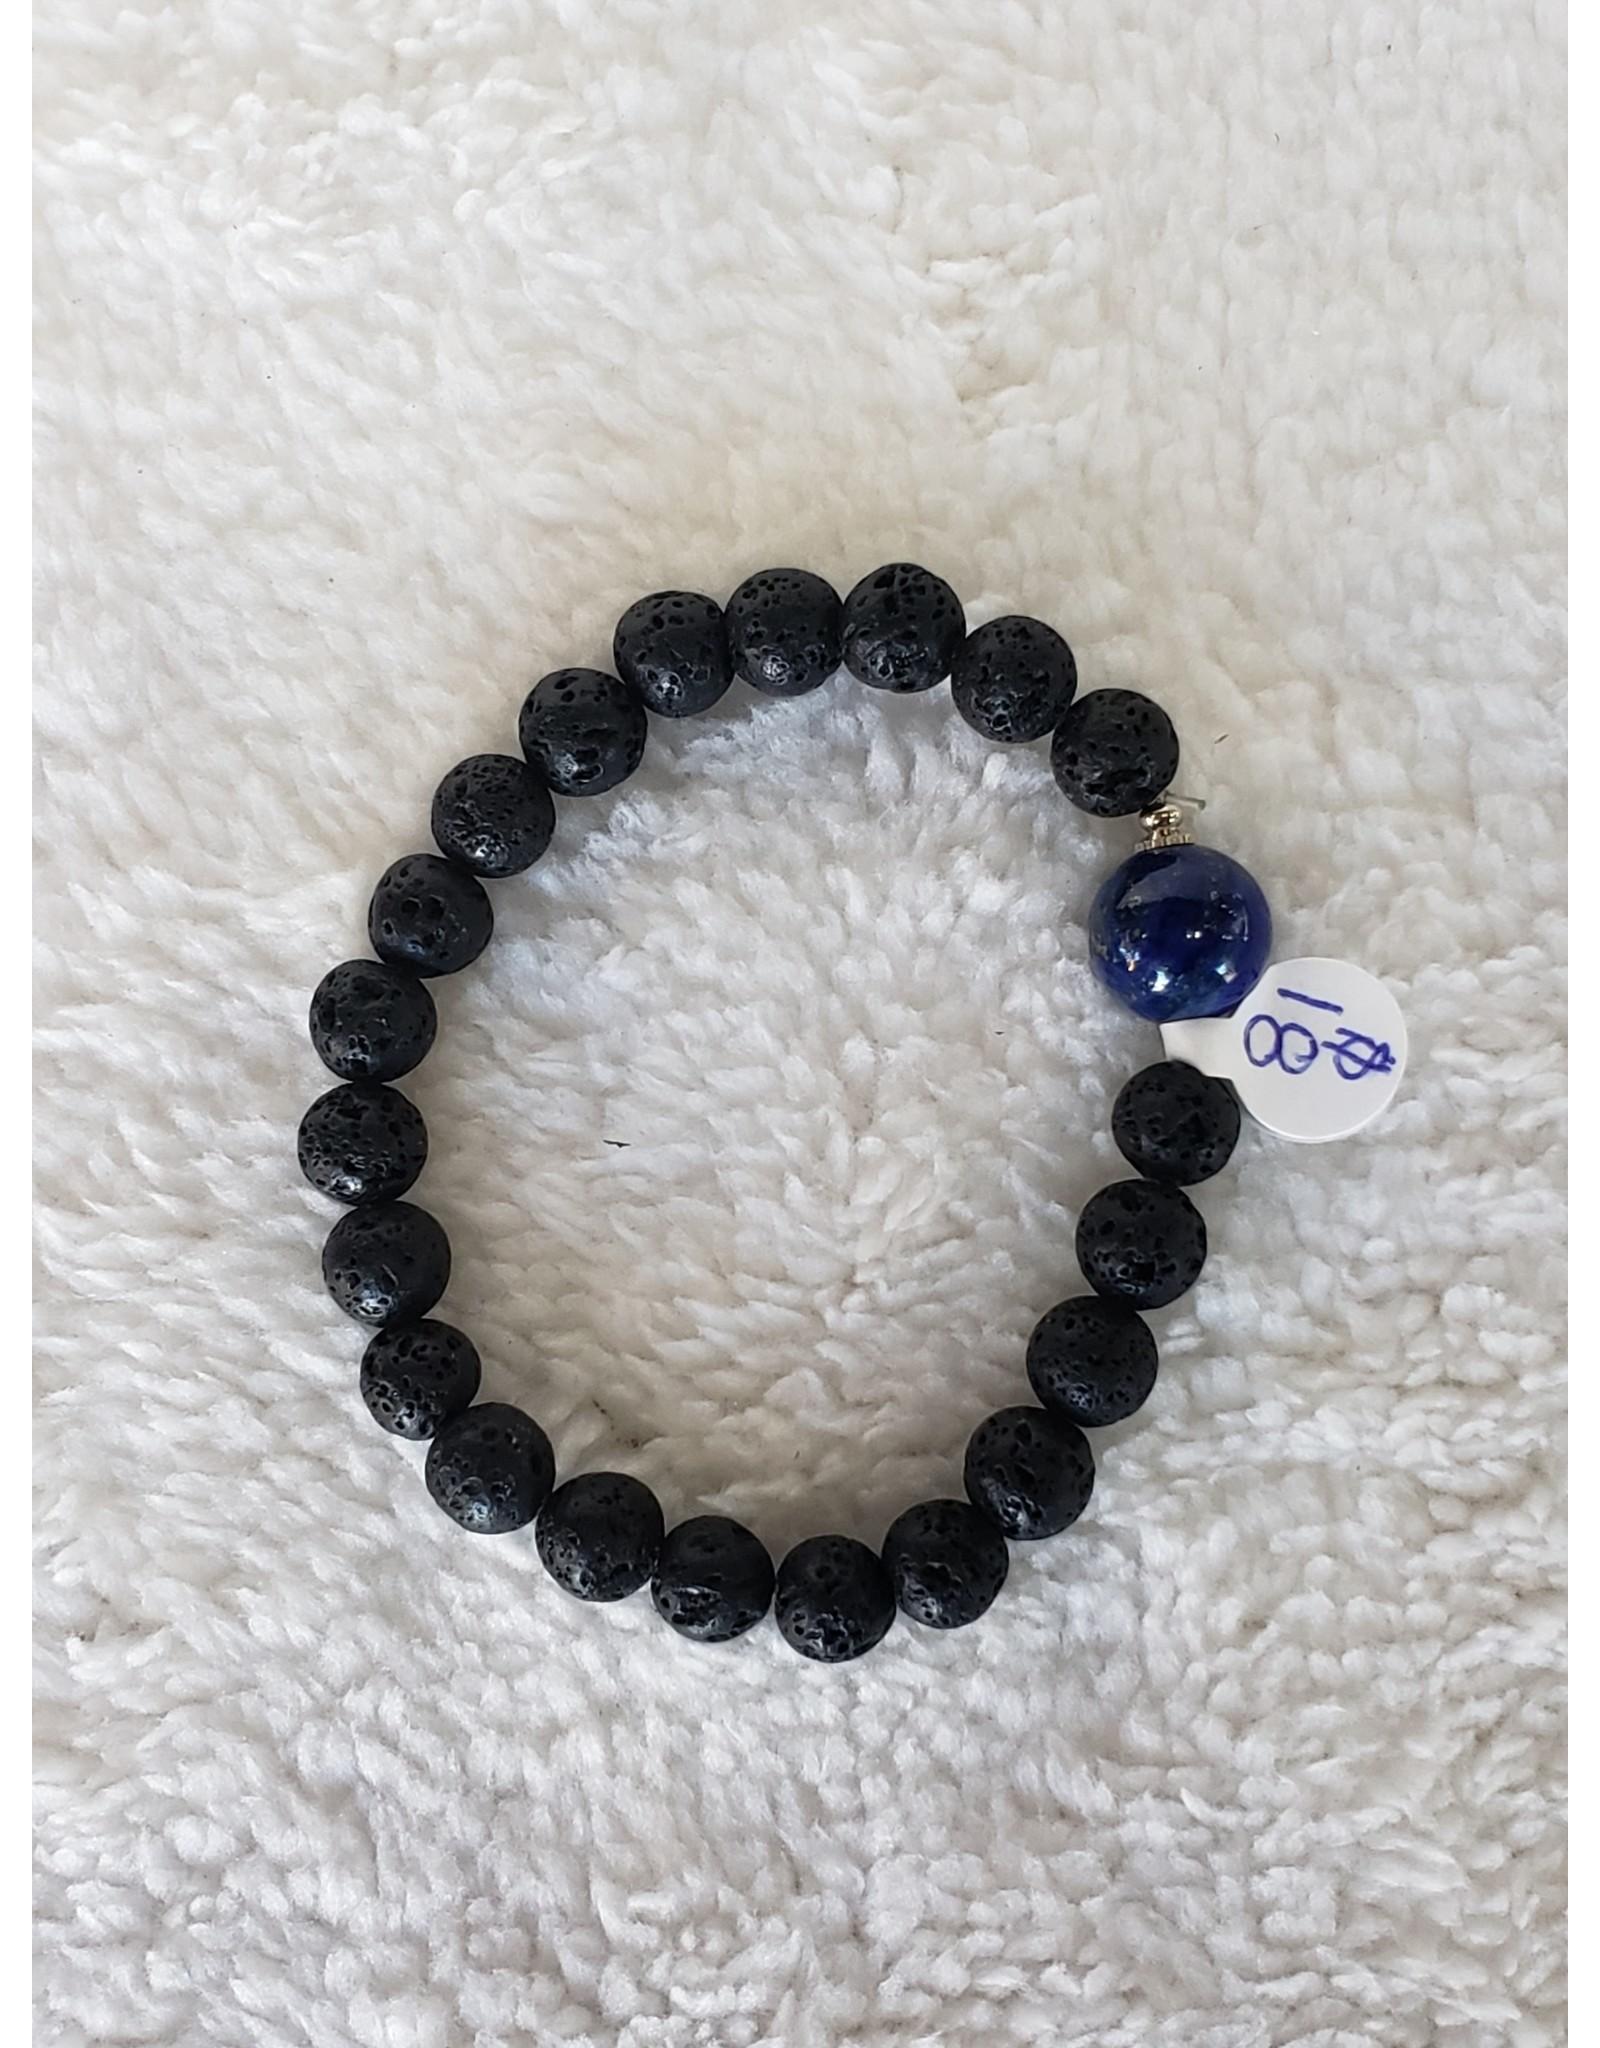 Aomatherapy Lava Stone Stretch Bracelet - Lapis Lazuli